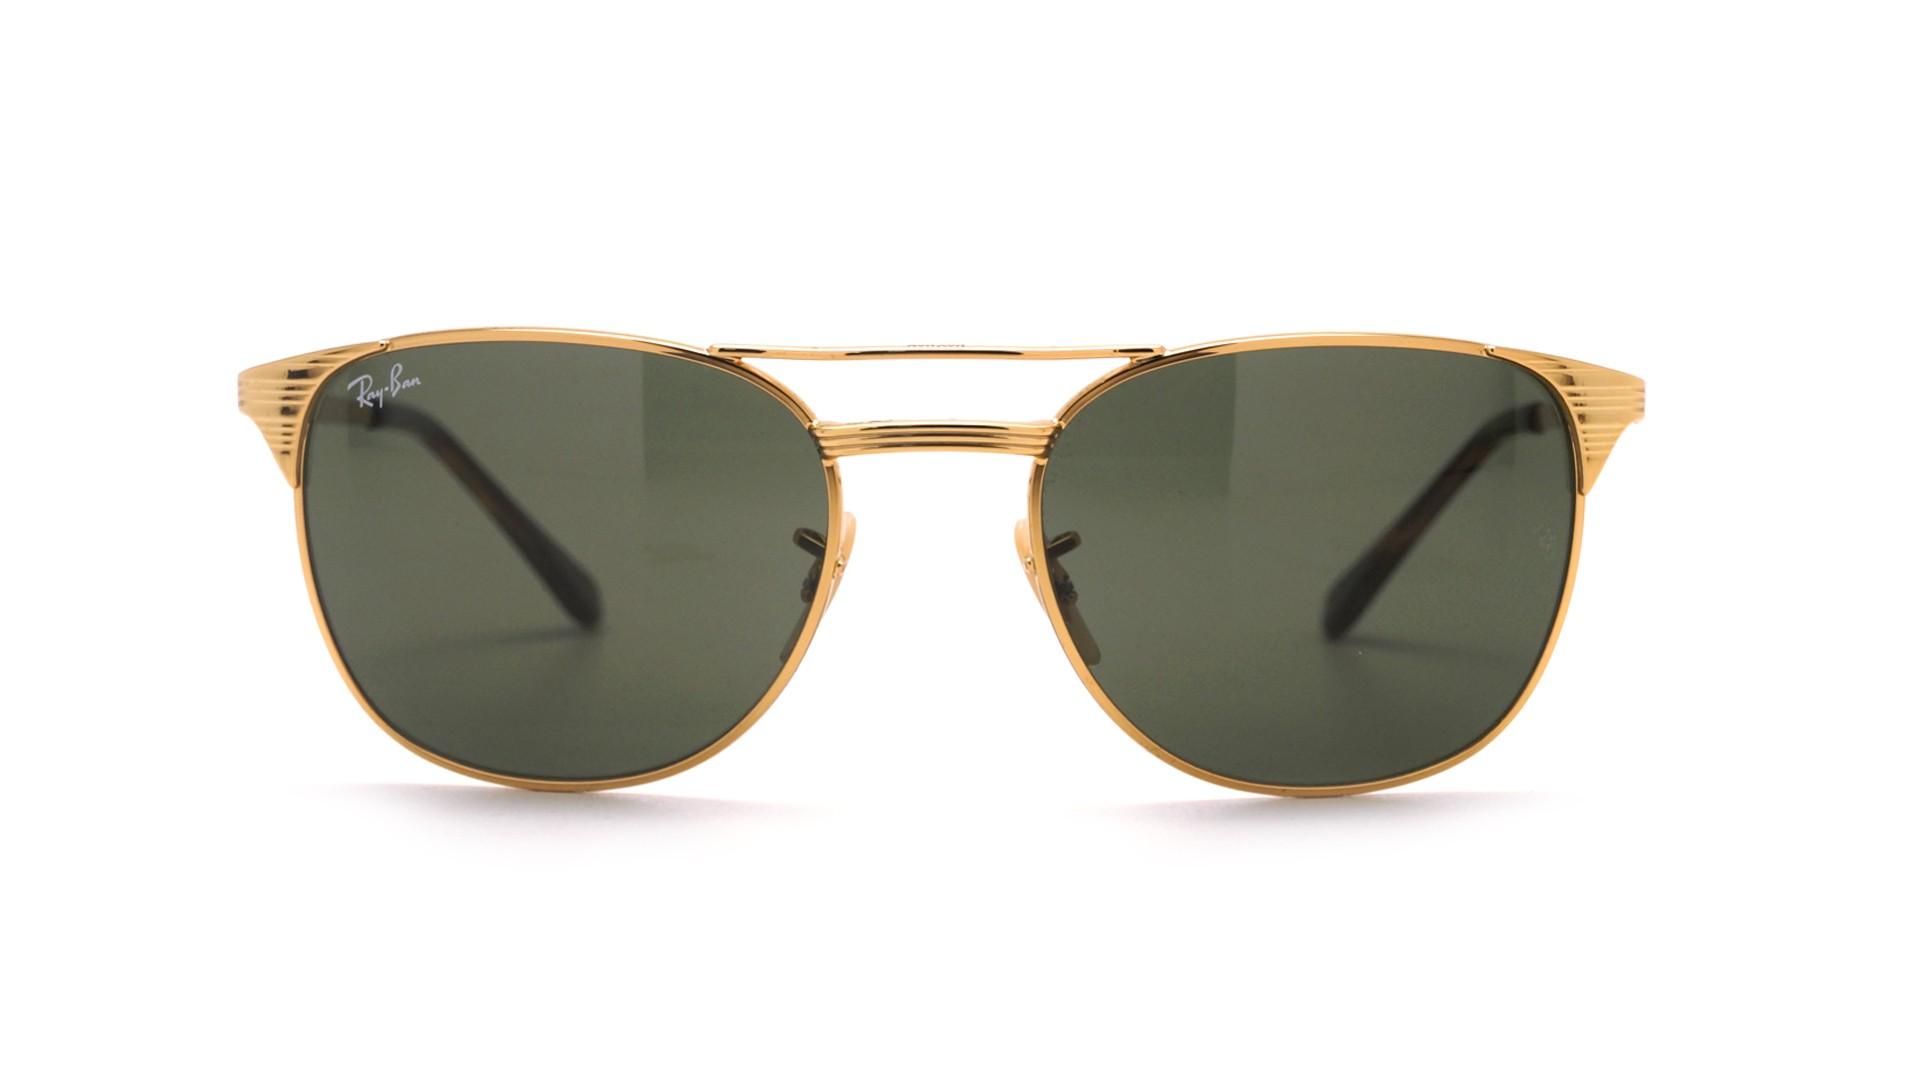 ef3403002a Sunglasses Ray-Ban Signet Gold G-15 RB3429M 001 55-19 Medium